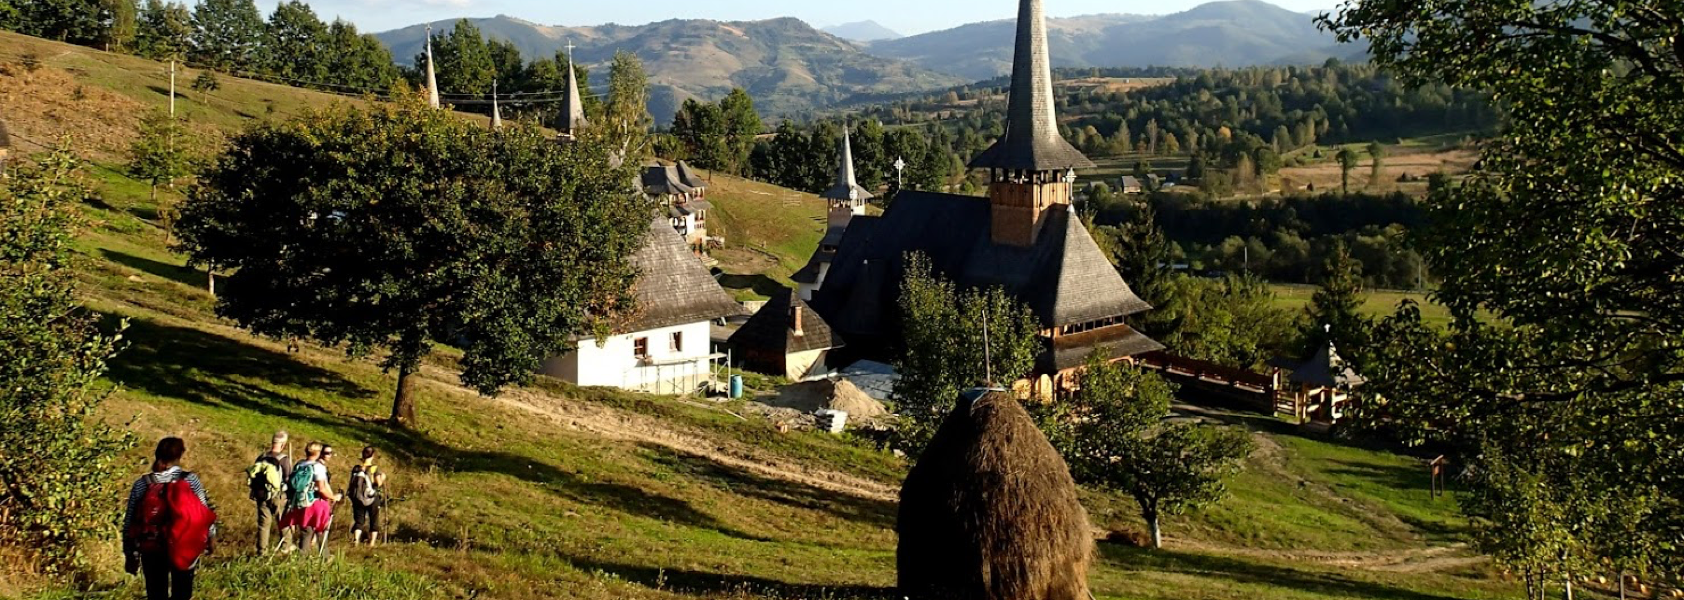 Groepsreis Roemenië | Wandelvakantie in gastvrij Roemenië